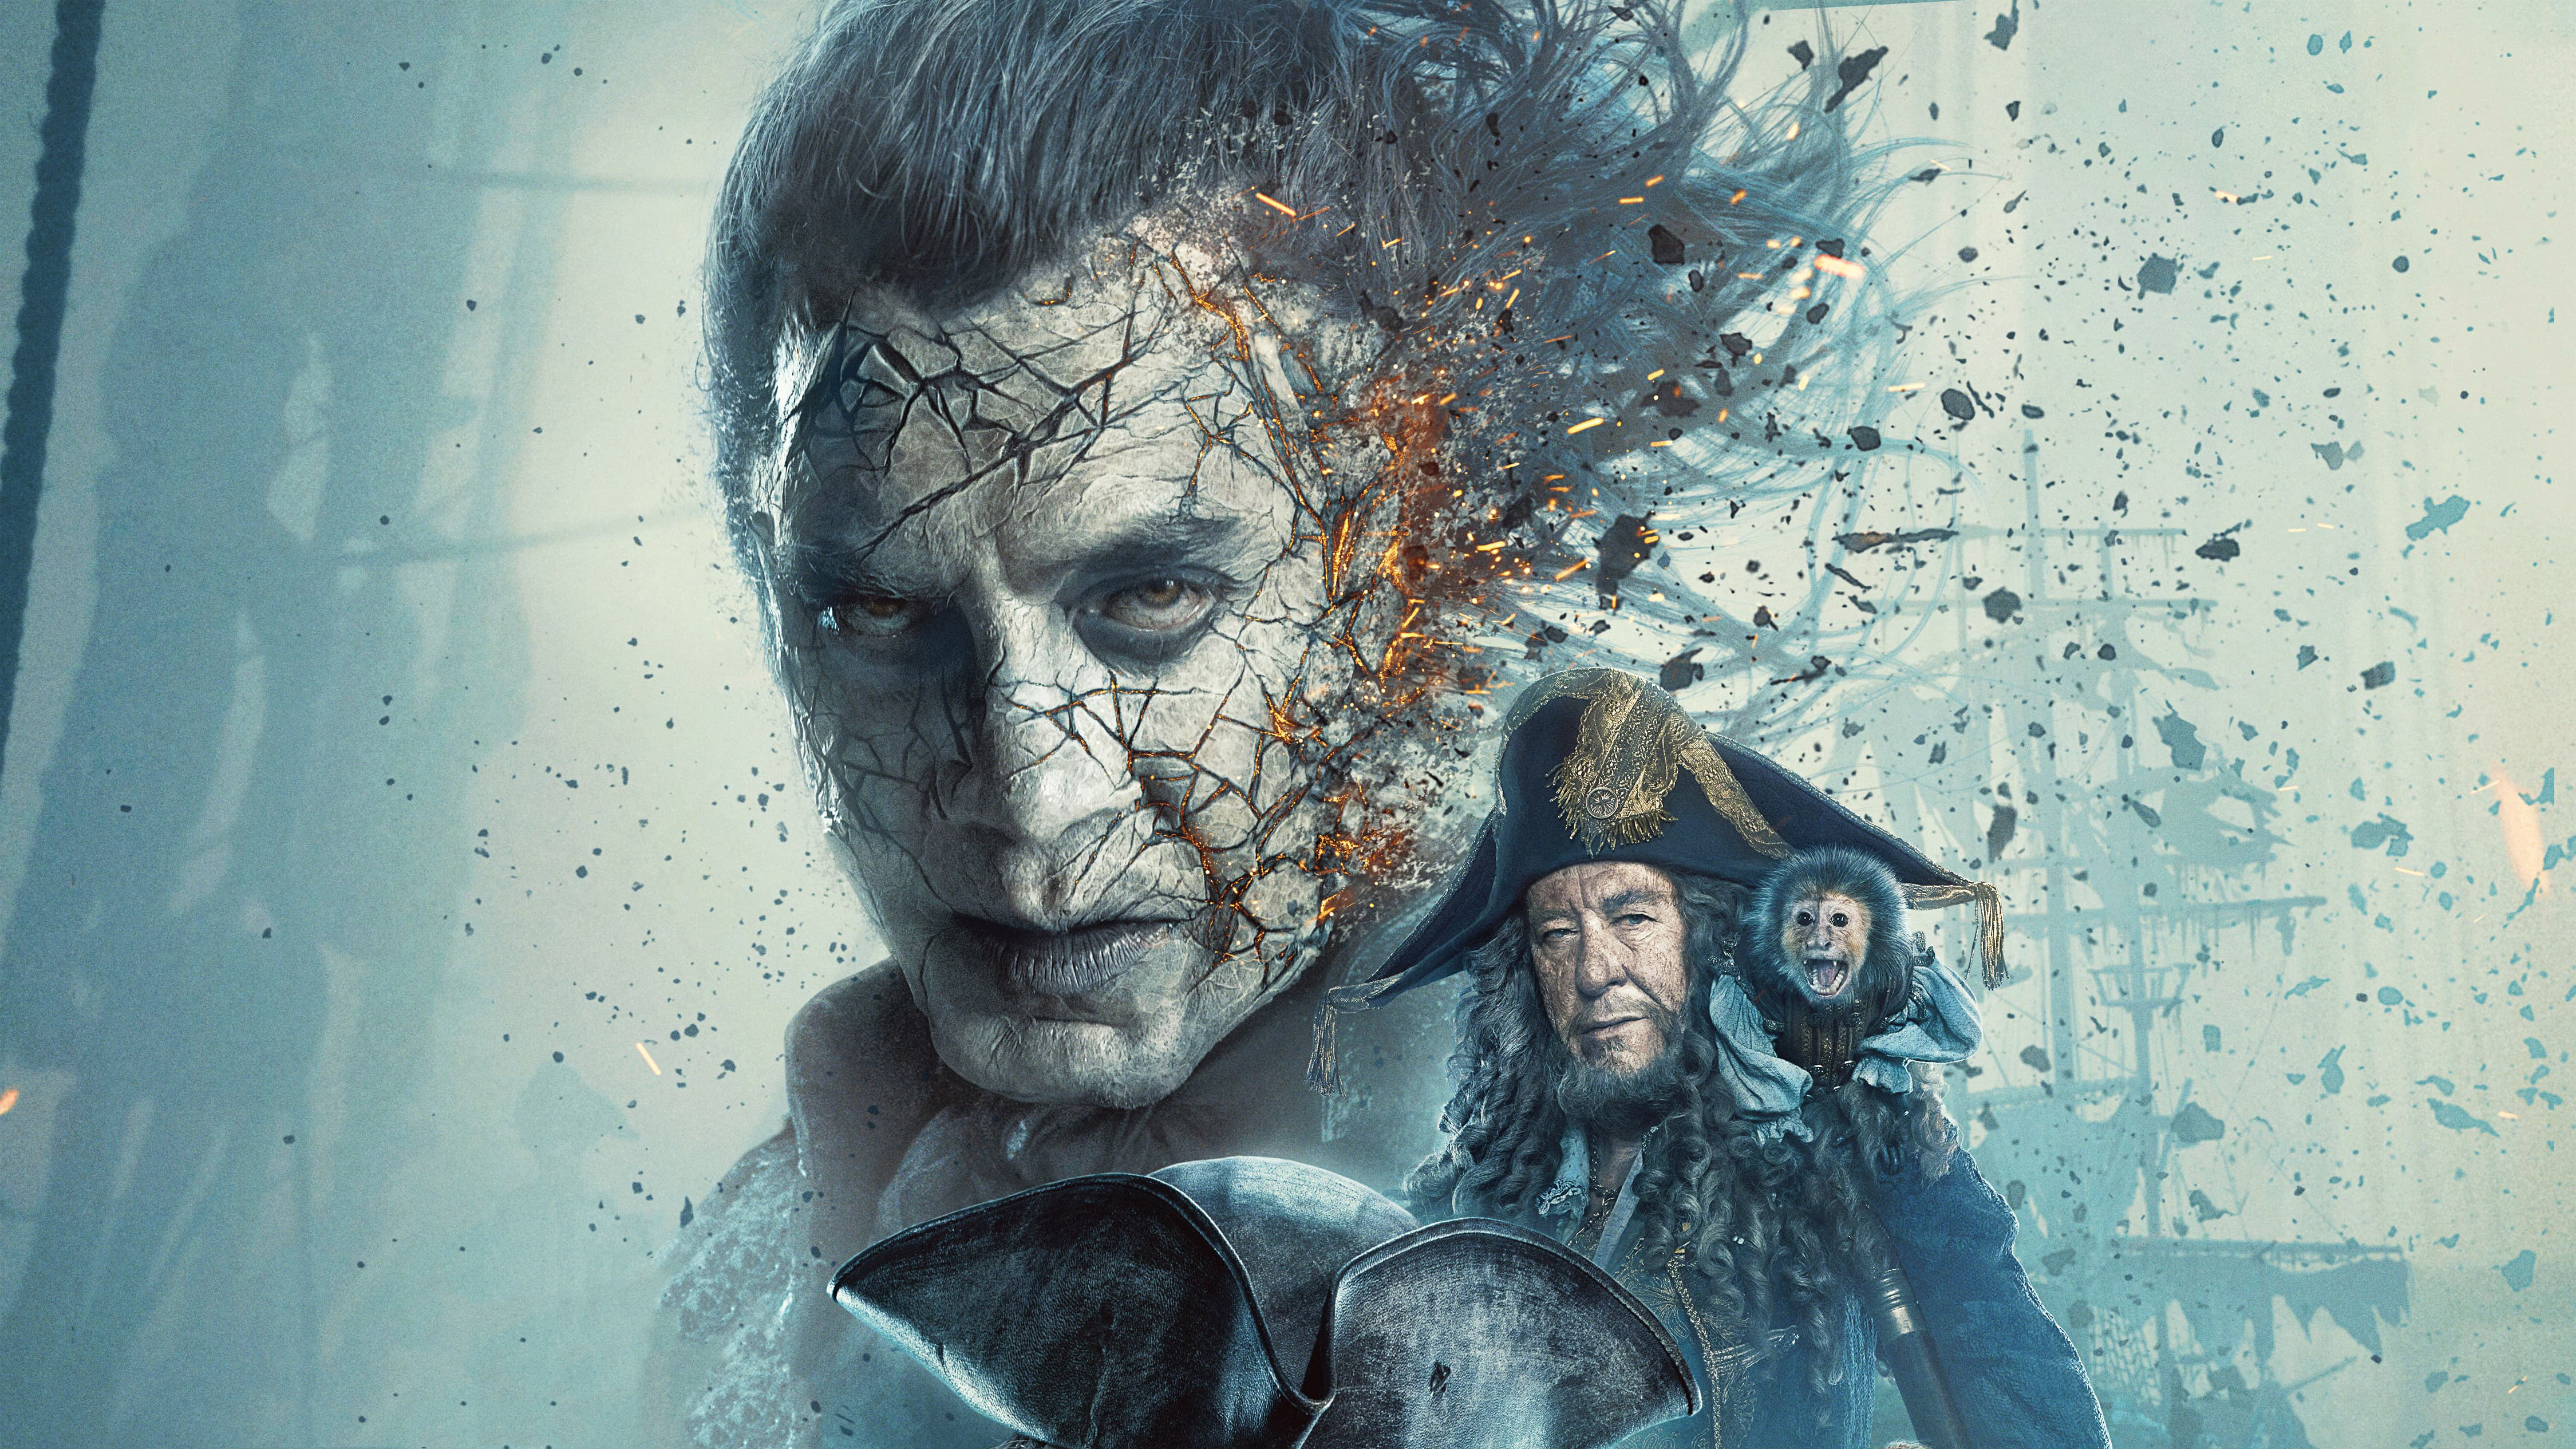 Caribbean Men: Pirates Of The Caribbean Dead Men Tell No Tales 2017 Movie